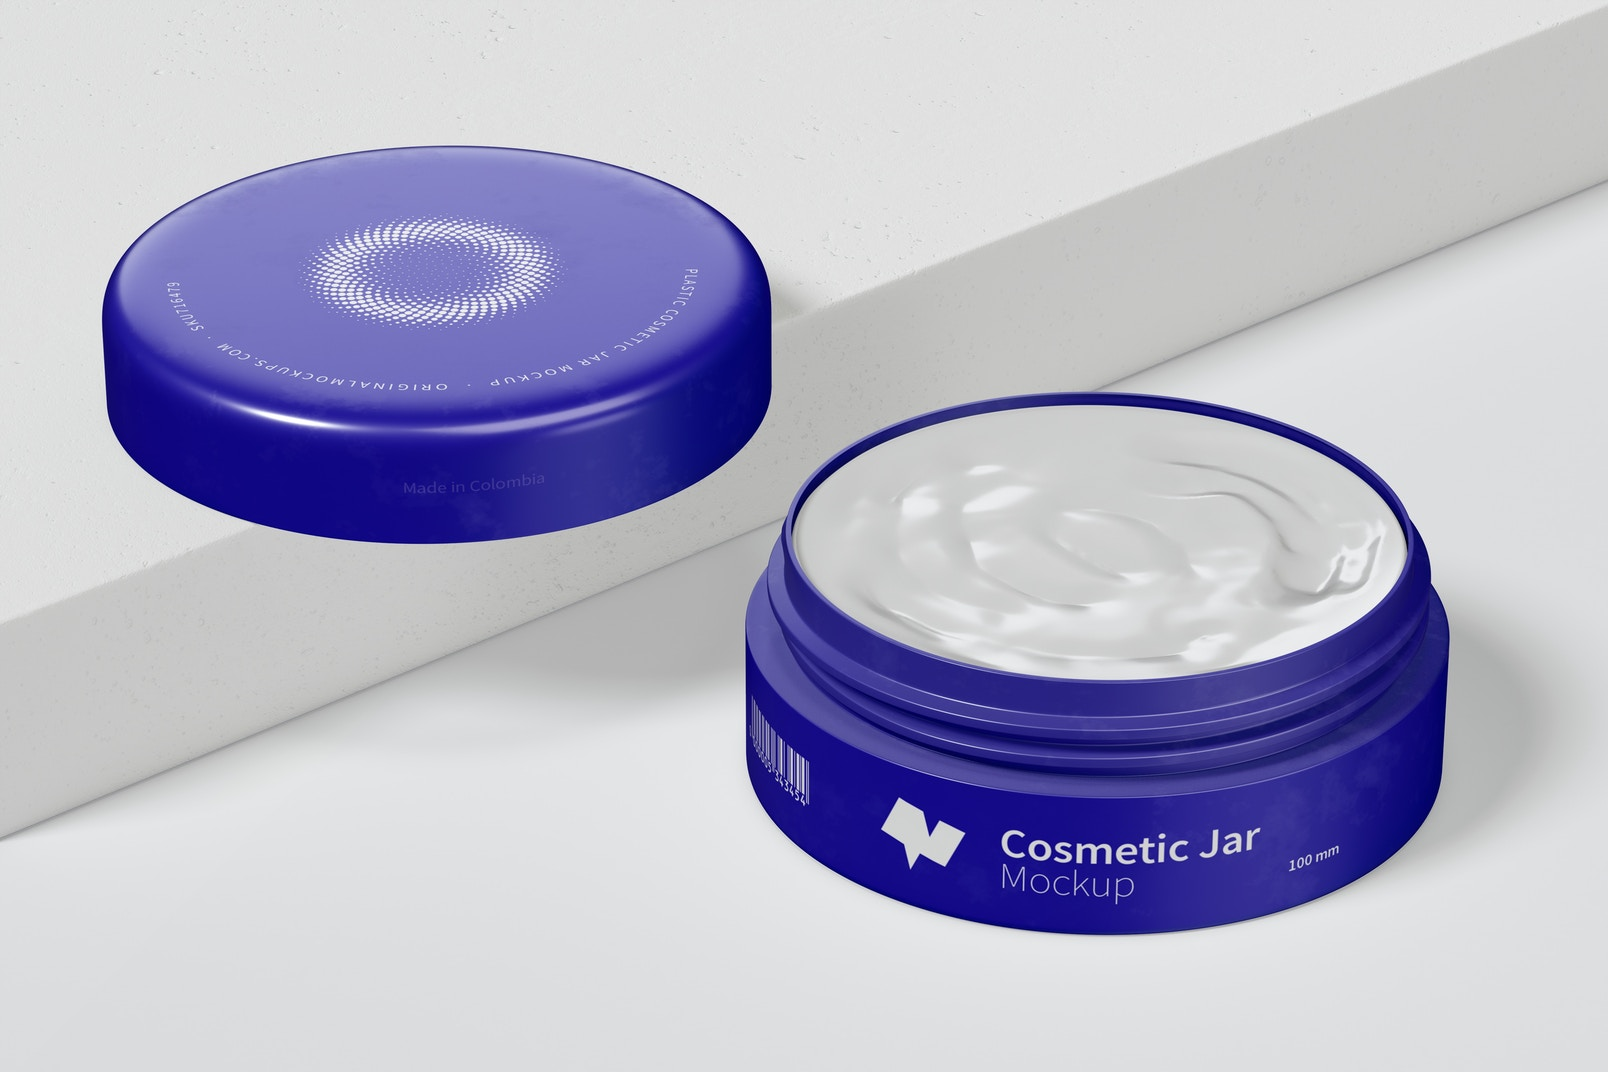 100mm Plastic Cosmetic Jar Mockup Opened